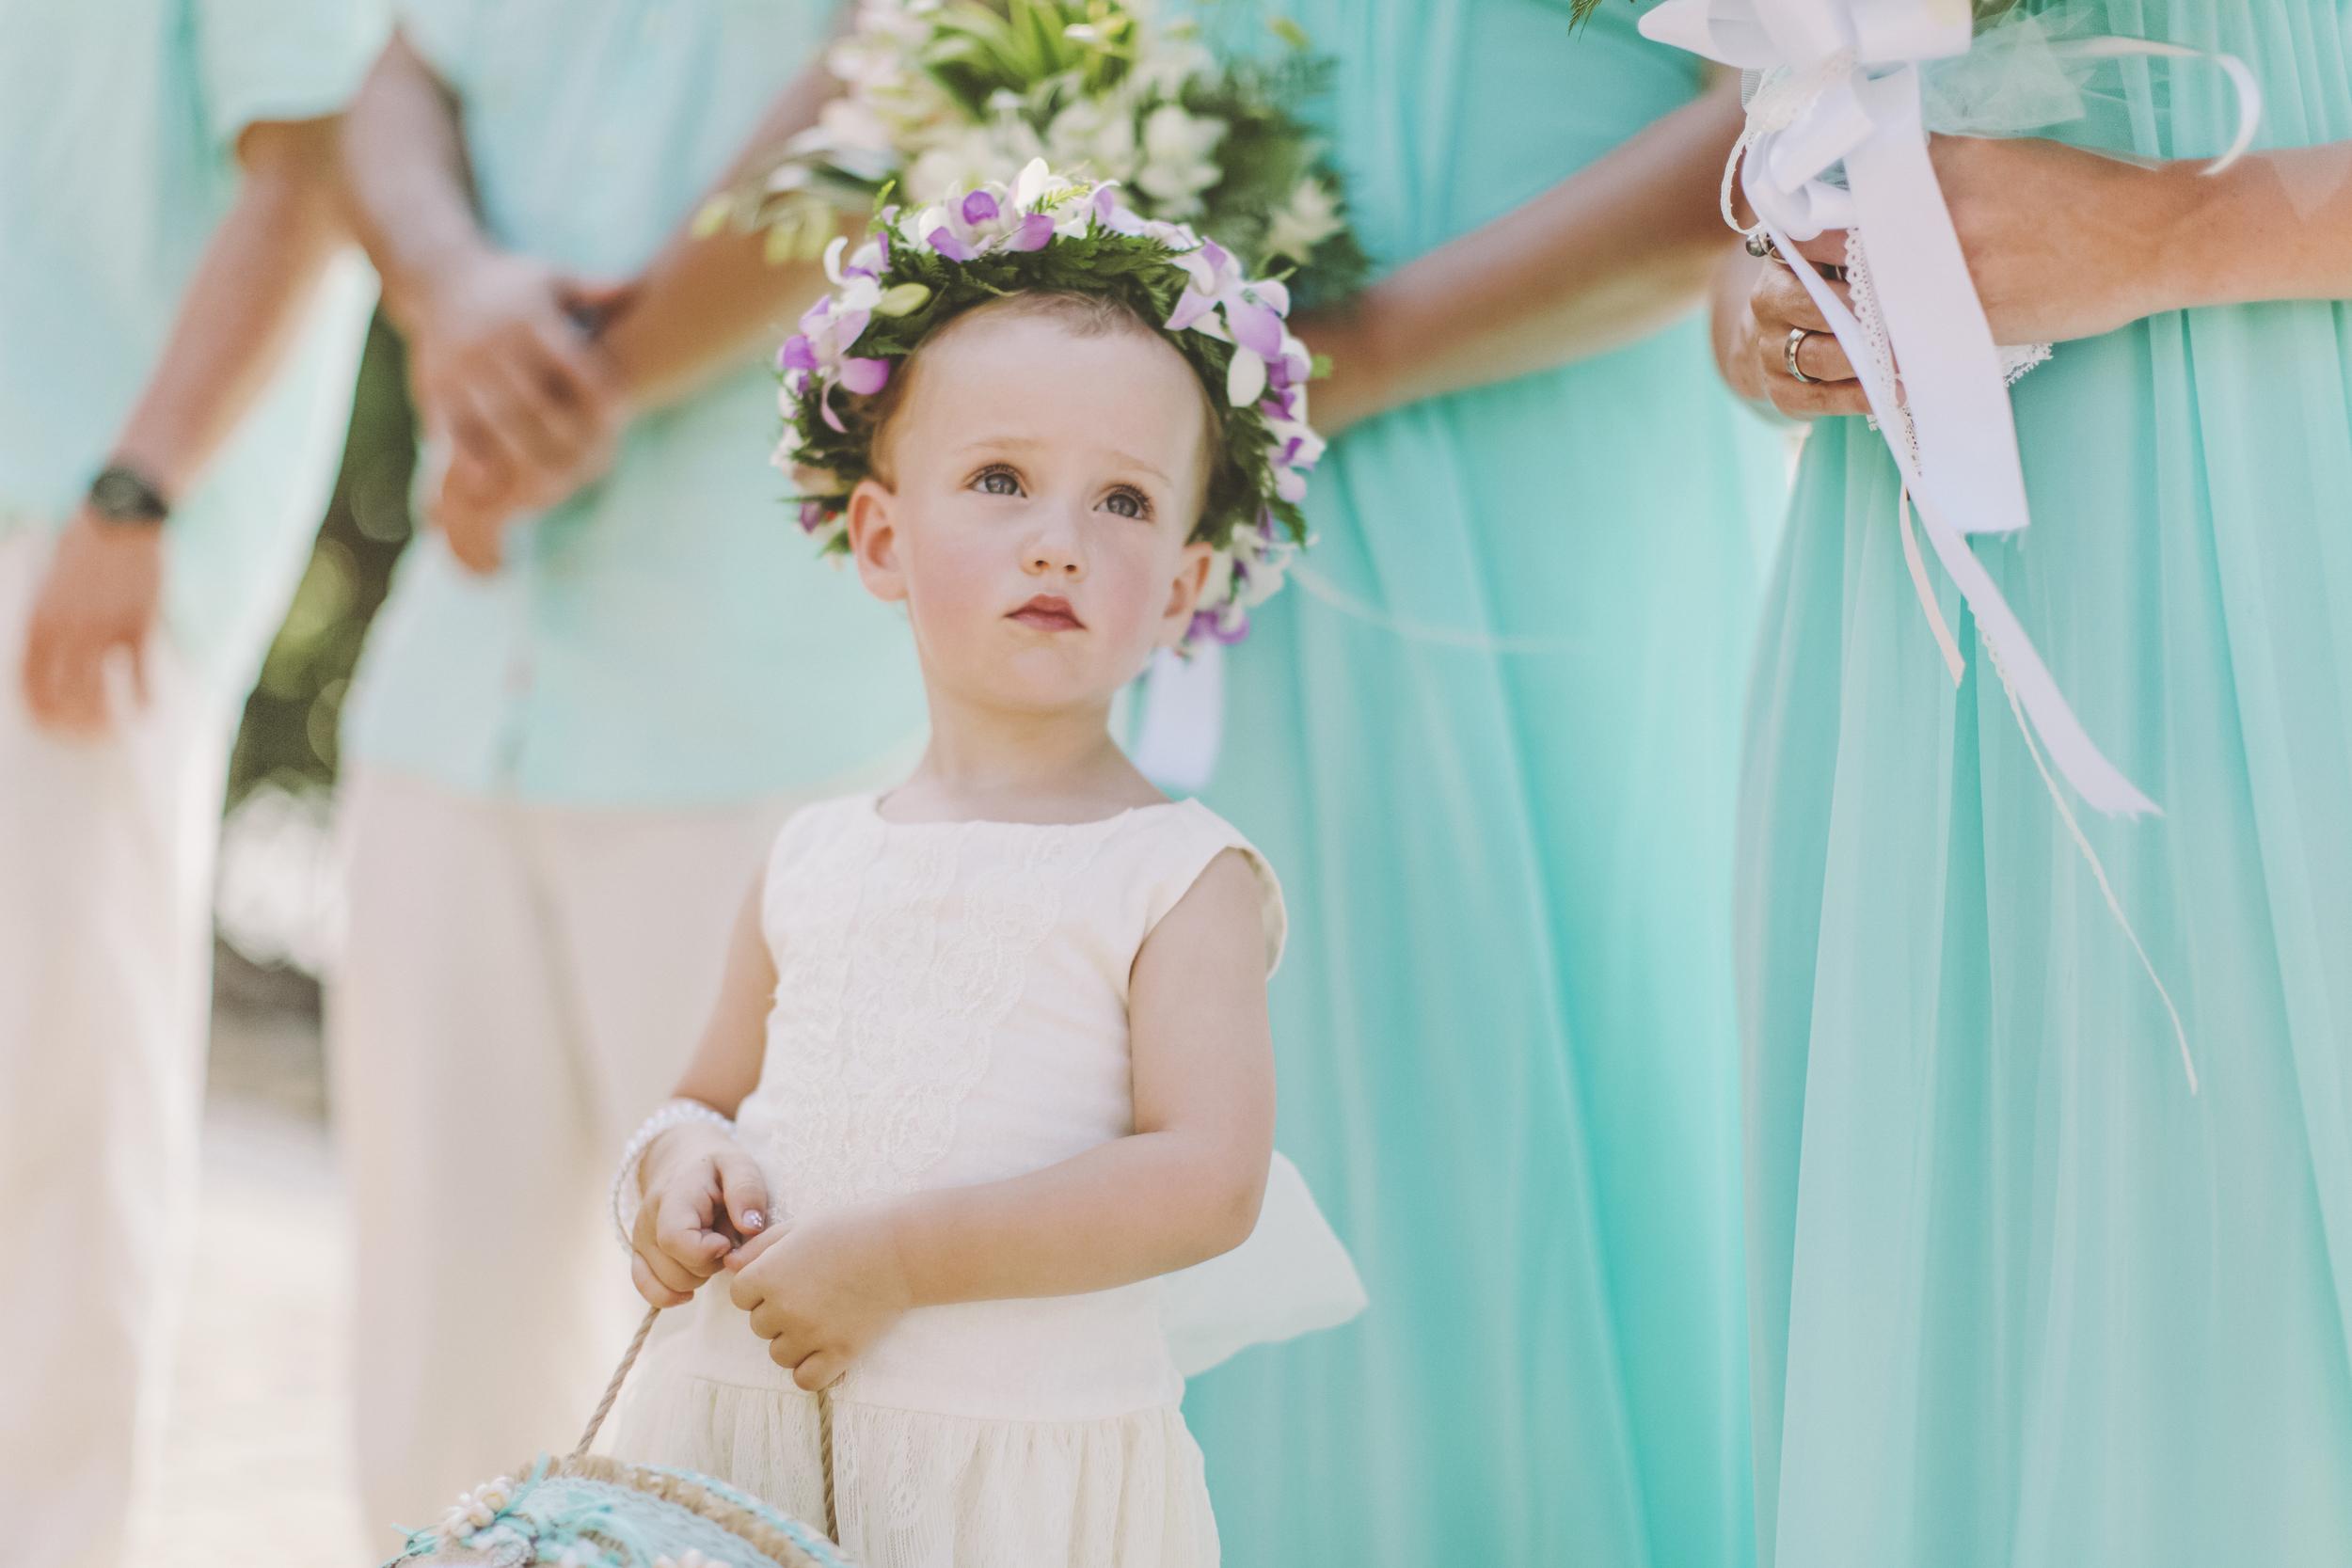 angie-diaz-photography-hawaii-wedding-photographer-kelli-jay-63.jpg